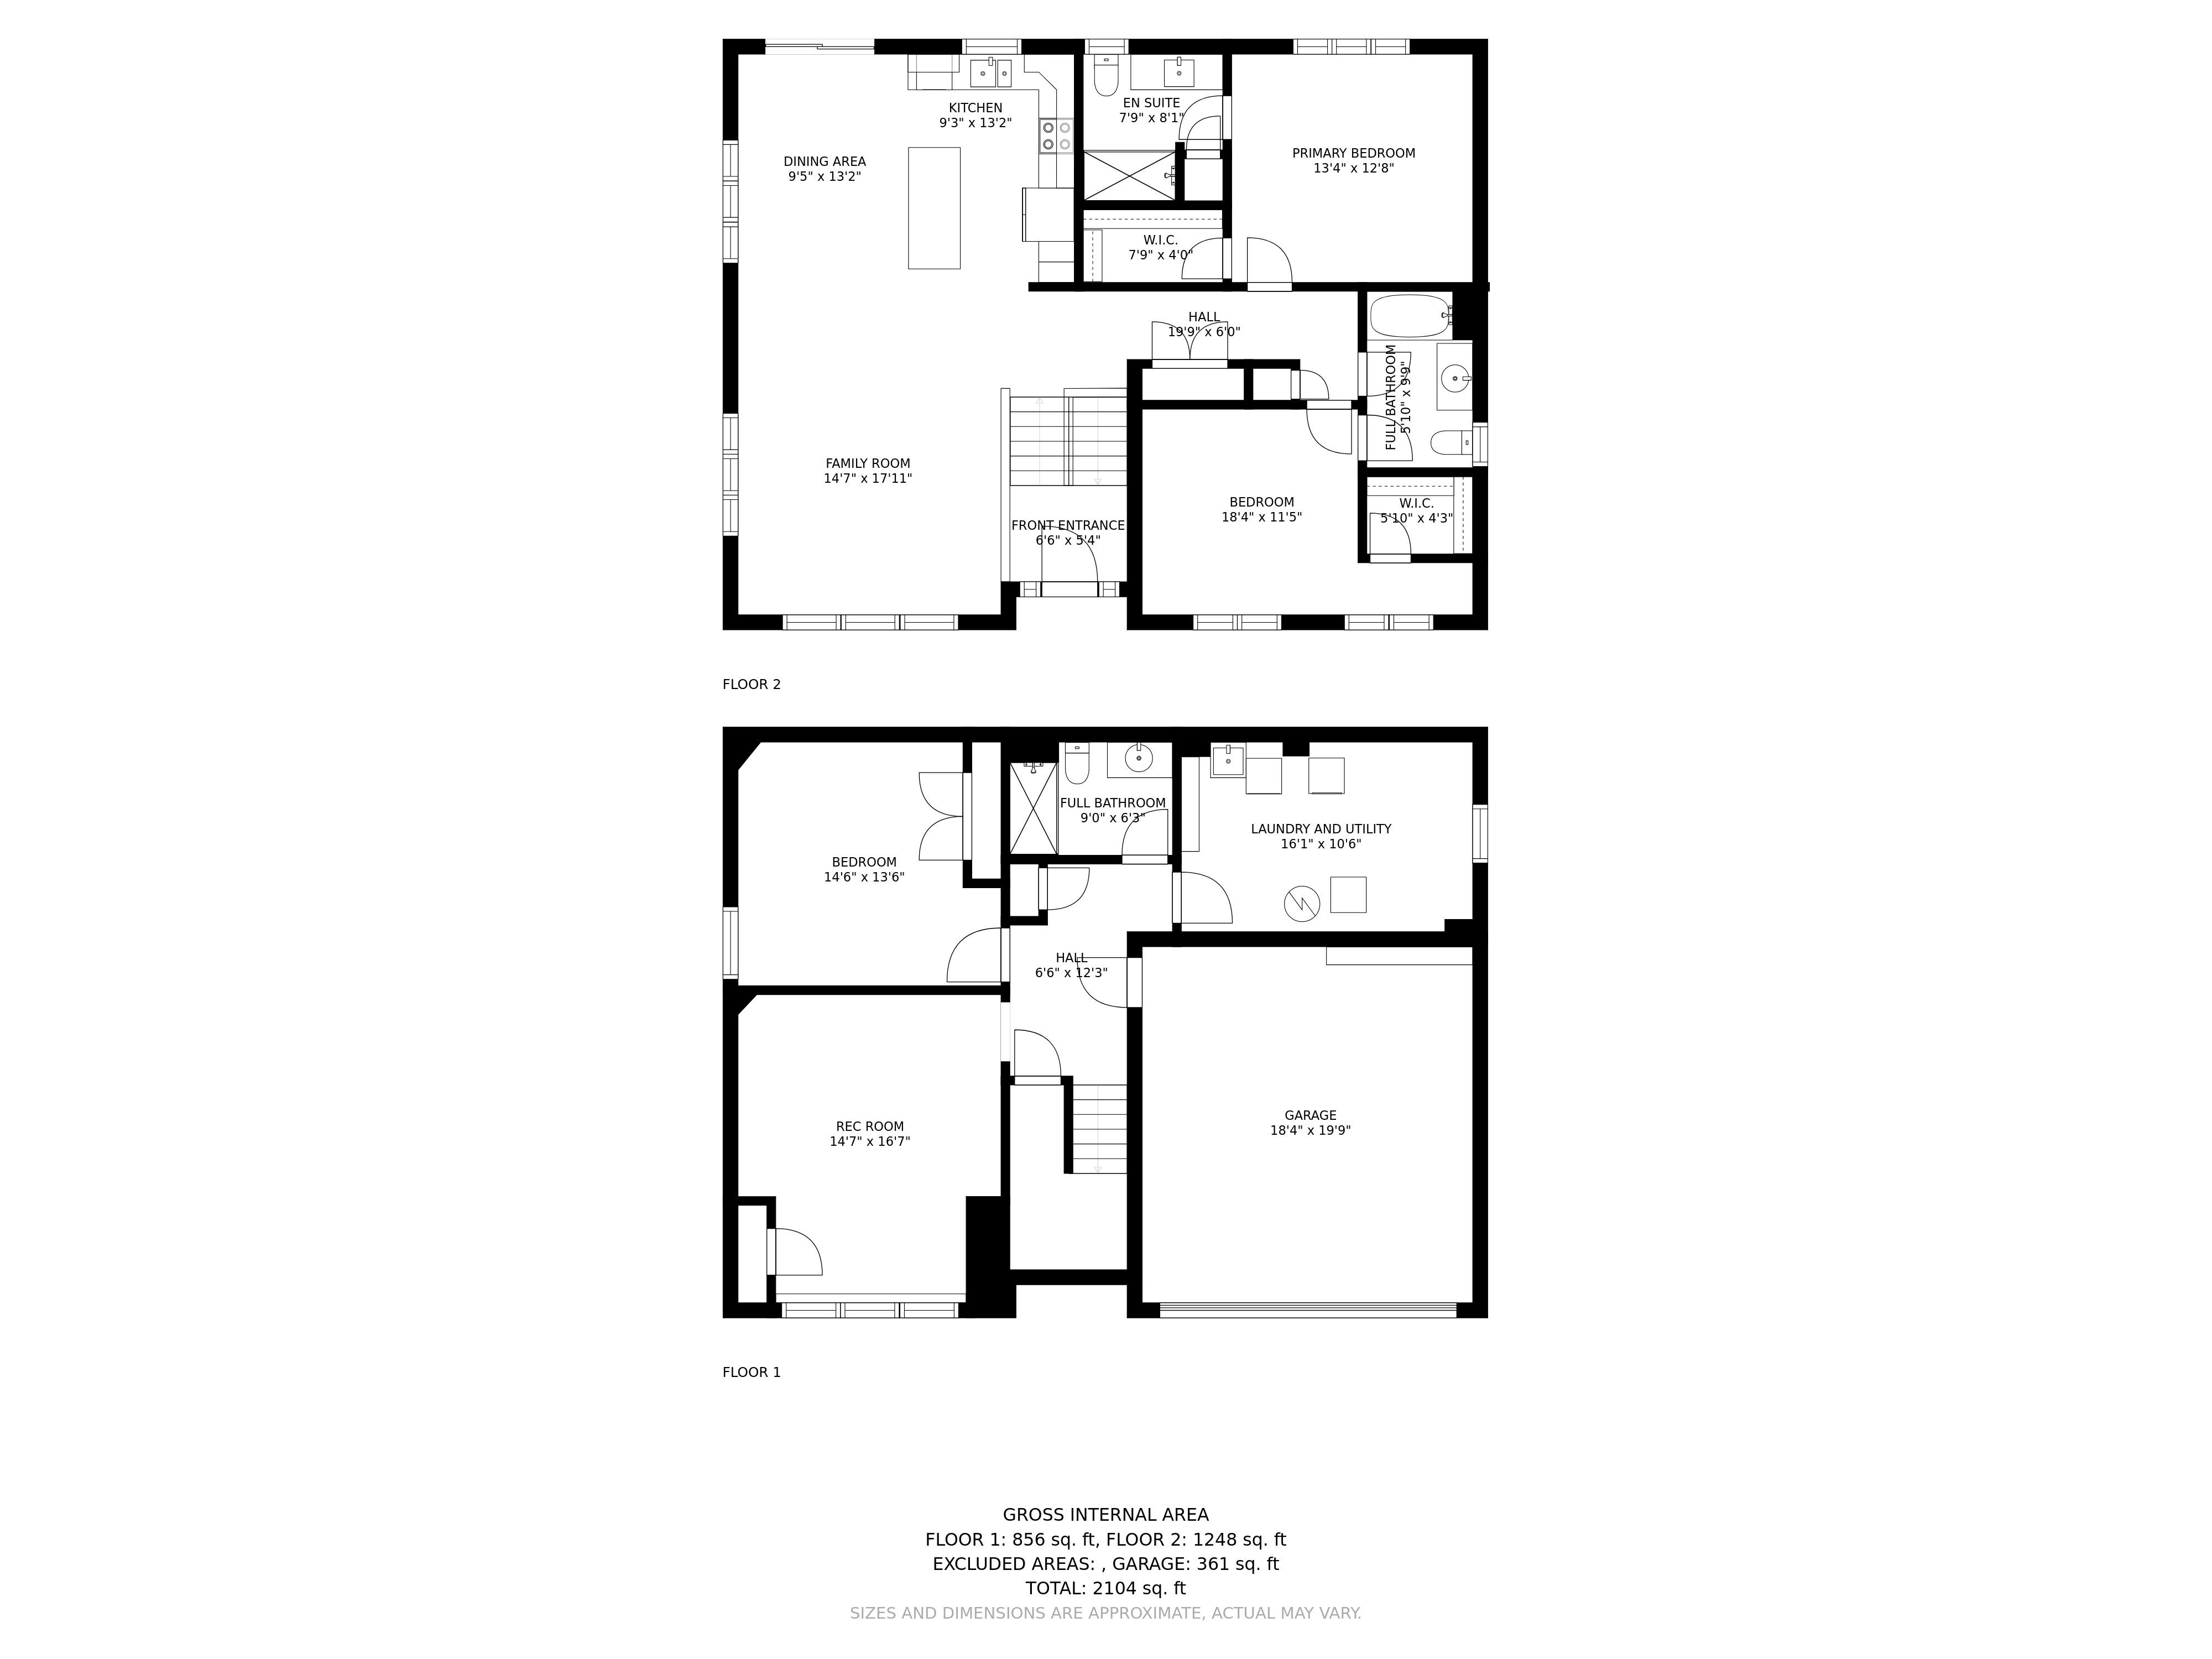 1010 Denton Dr floorplan